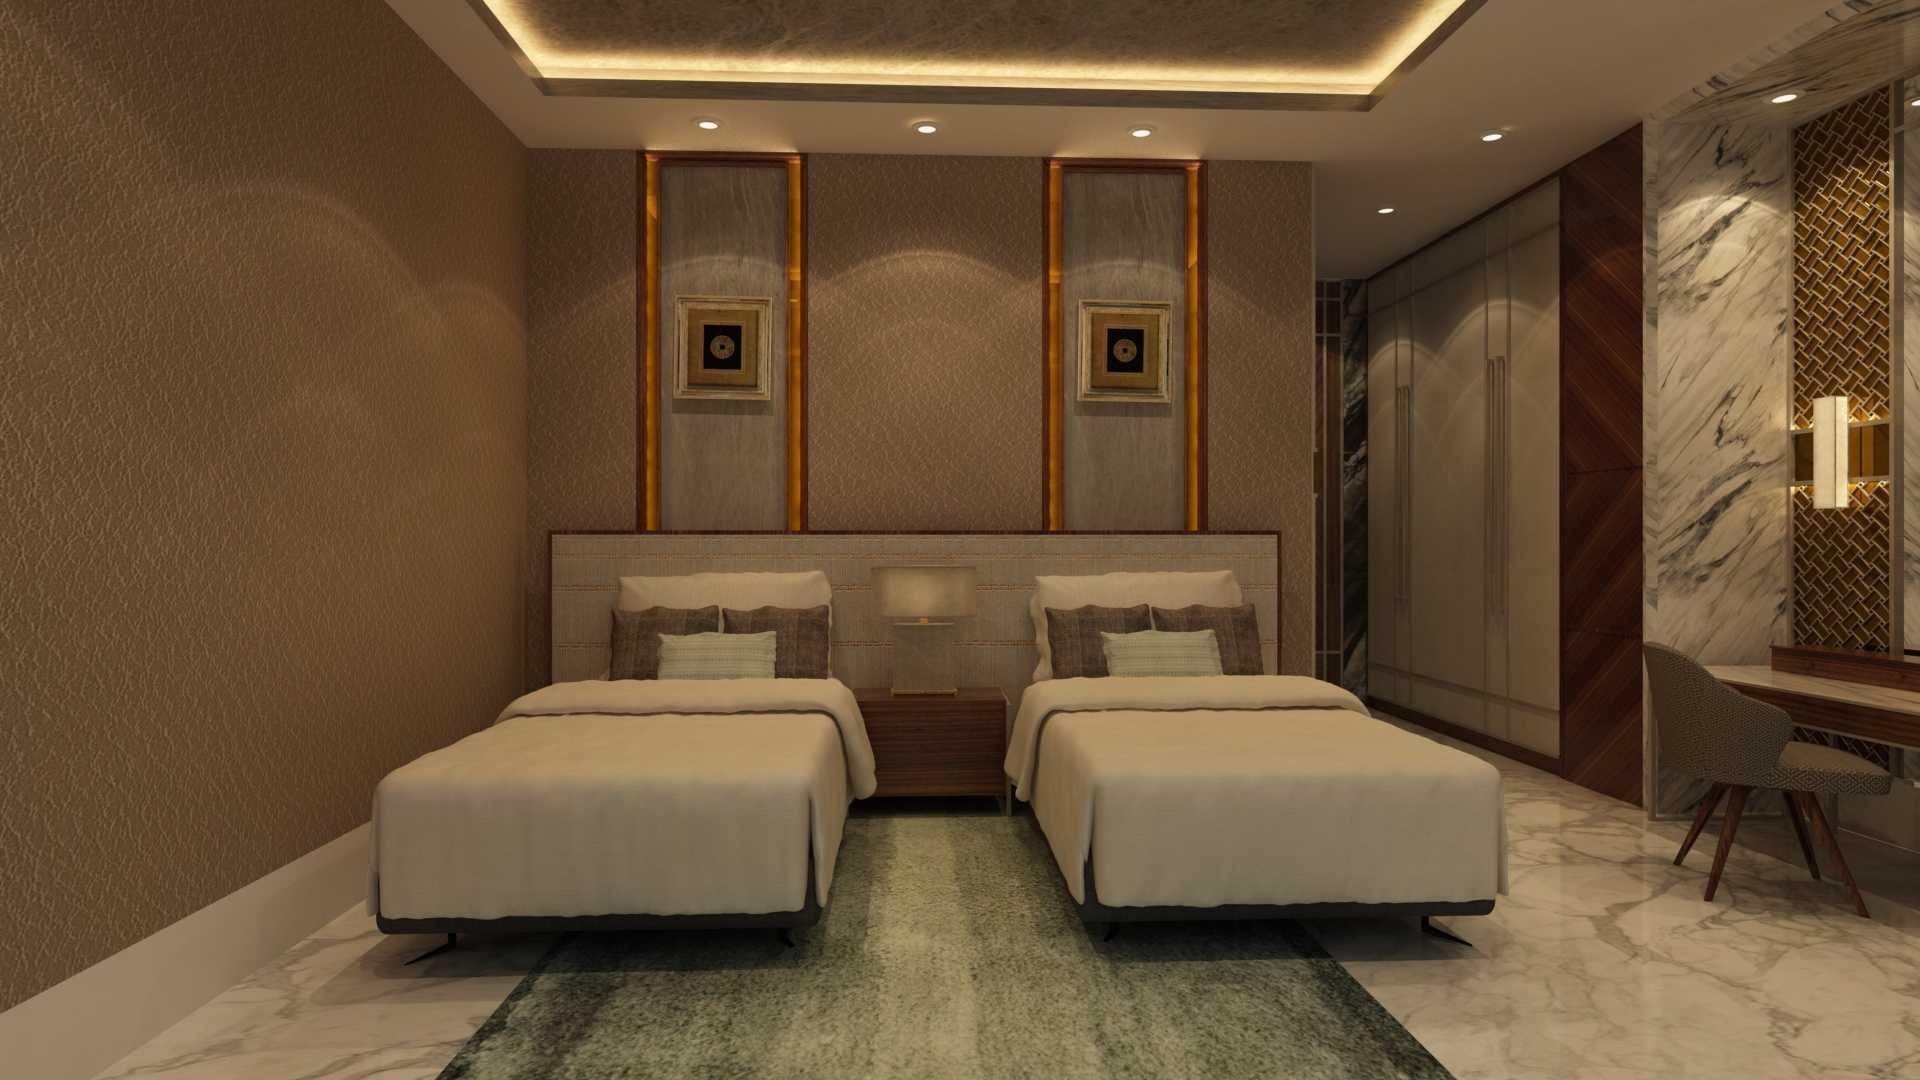 Vin•da•te Mayang Permai Residence Ii - Residential Project (Artist Impression - Construction In Progress) Pantai Indah Kapuk - North Jakarta Pantai Indah Kapuk - North Jakarta Photo-17204 Kontemporer  17204